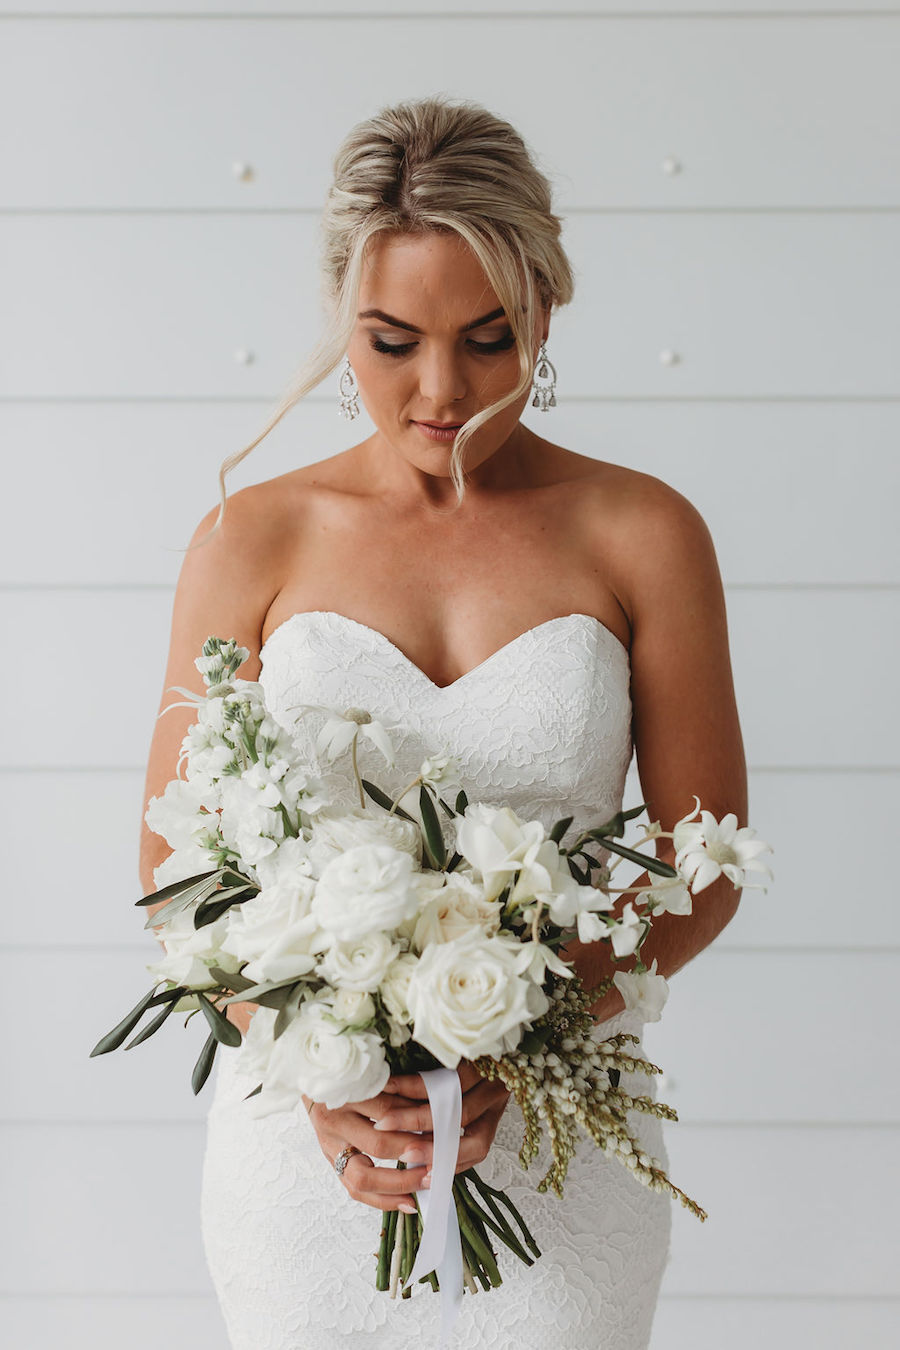 tweed-coast-weddings-wedding-venue-osteria-casuarina-ceremony-reception-5D3A6808.jpg